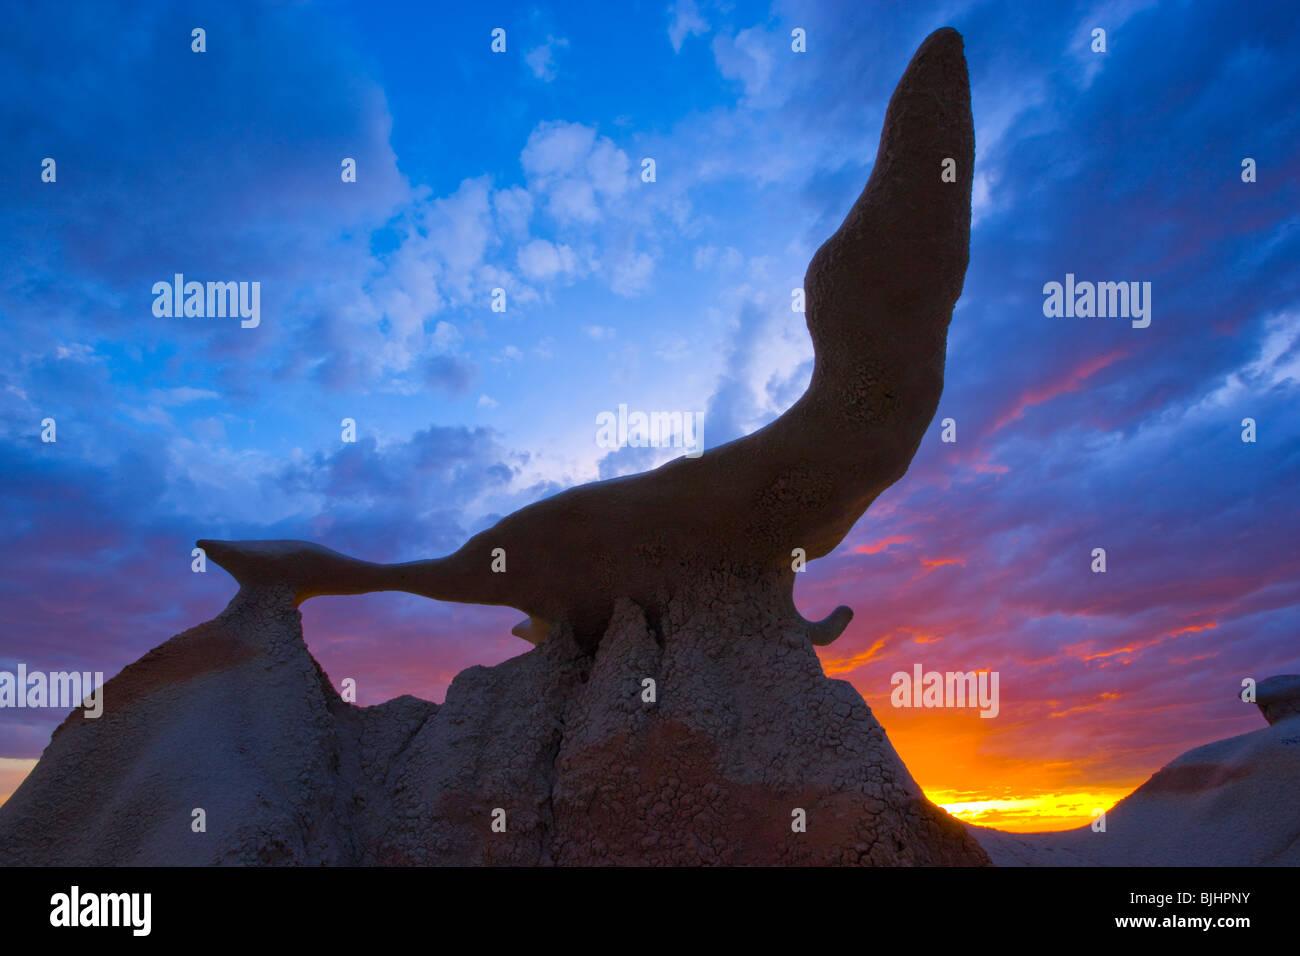 Seal Rock at sunset, Bisti Wilderness, New Mexico, Finely balanced rock, Badlands area near Farmington, New Mexico, - Stock Image